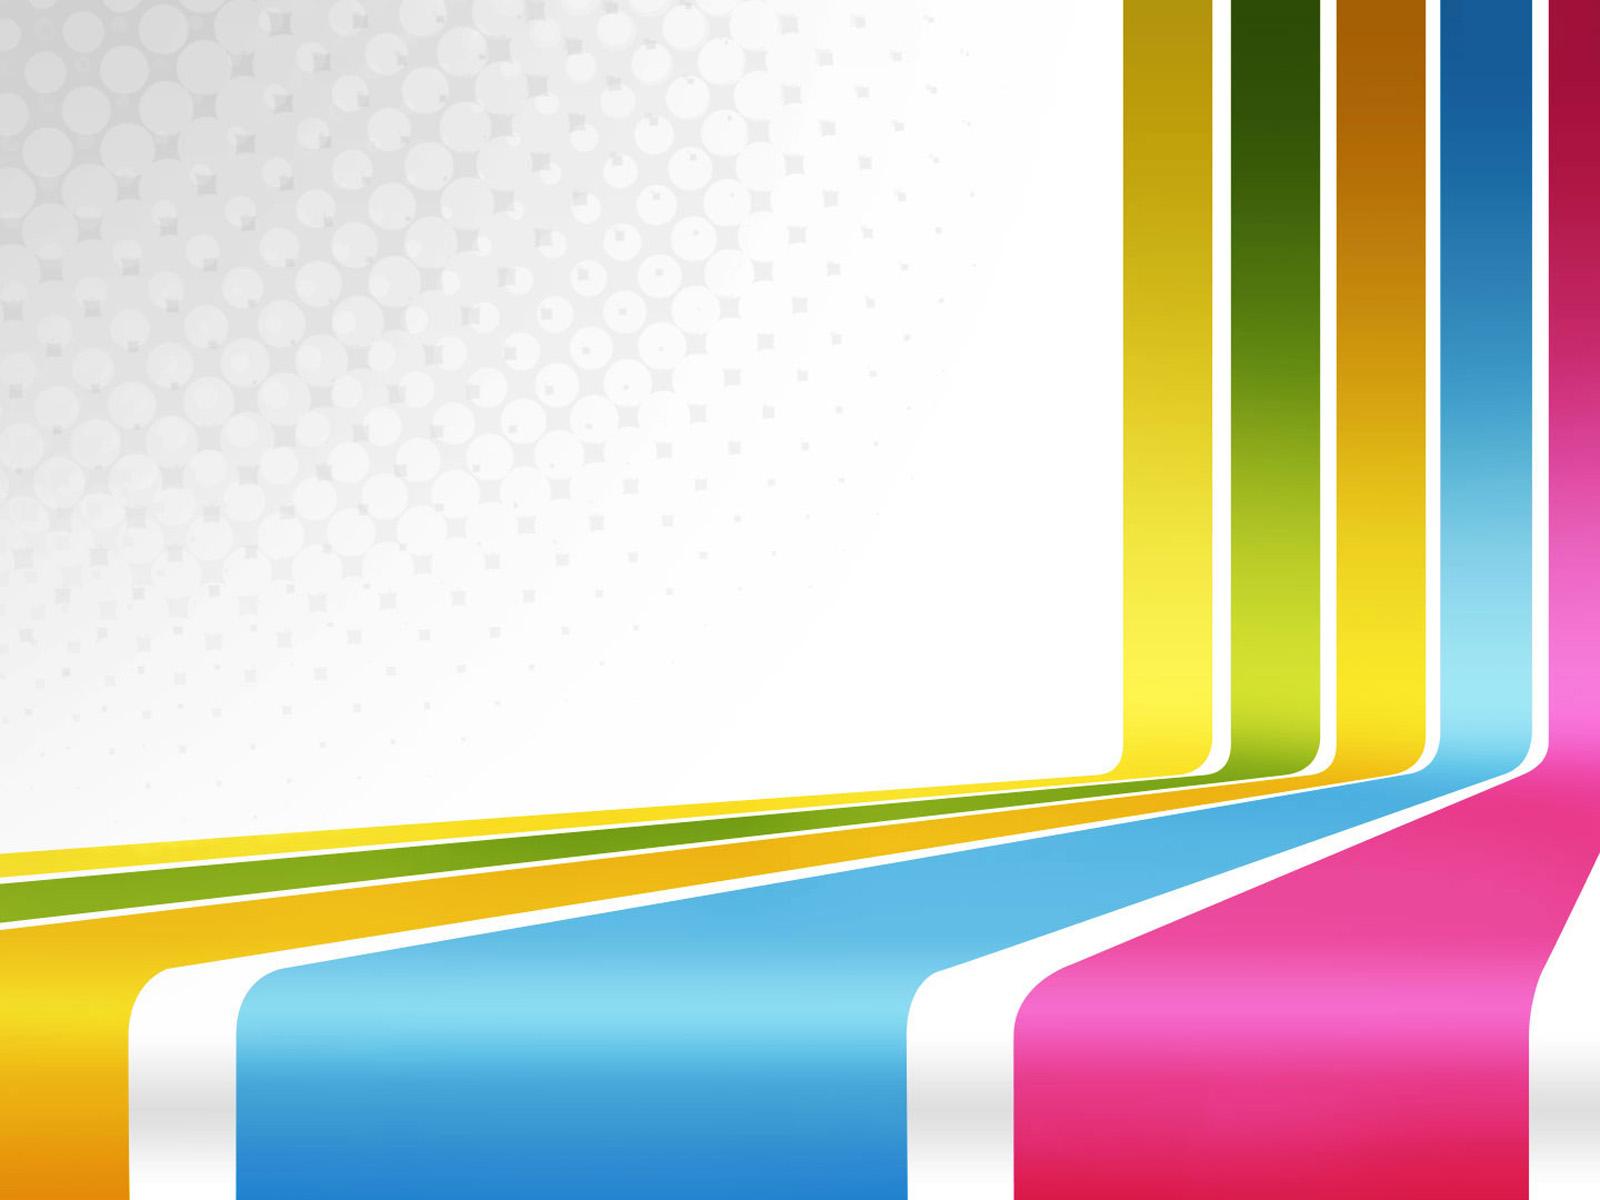 imagesdesign-33.jpg